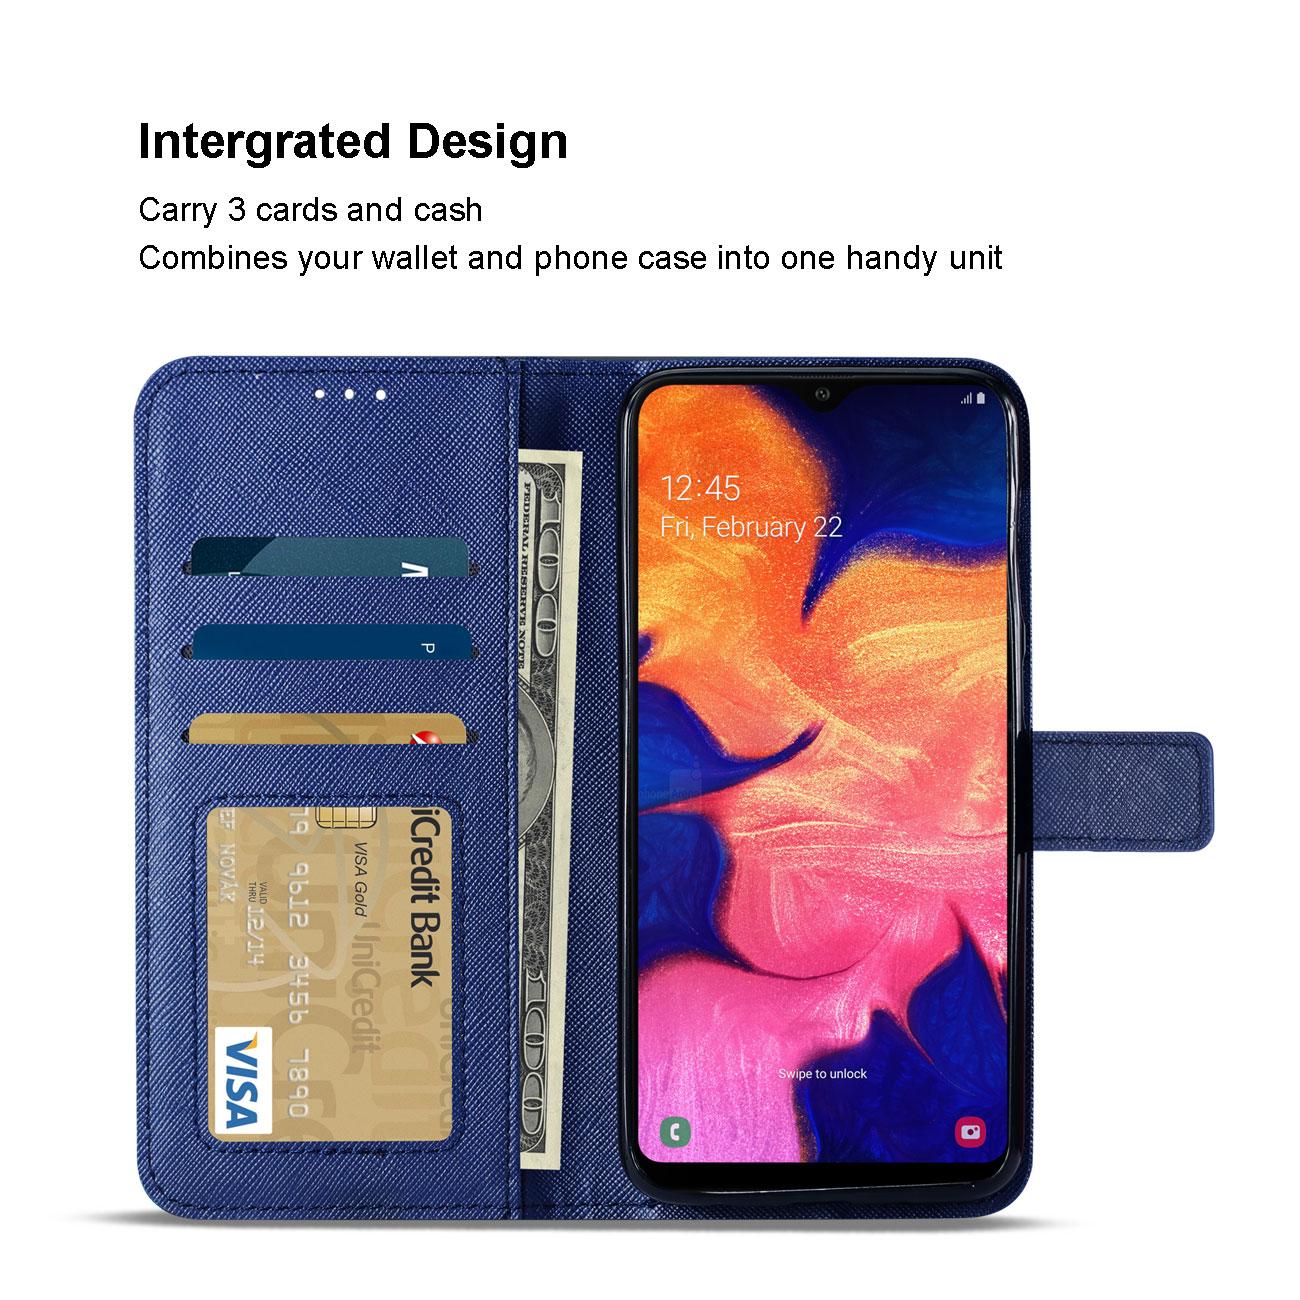 SAMSUNG GALAXY A10 3-In-1 Wallet Case In BLUE